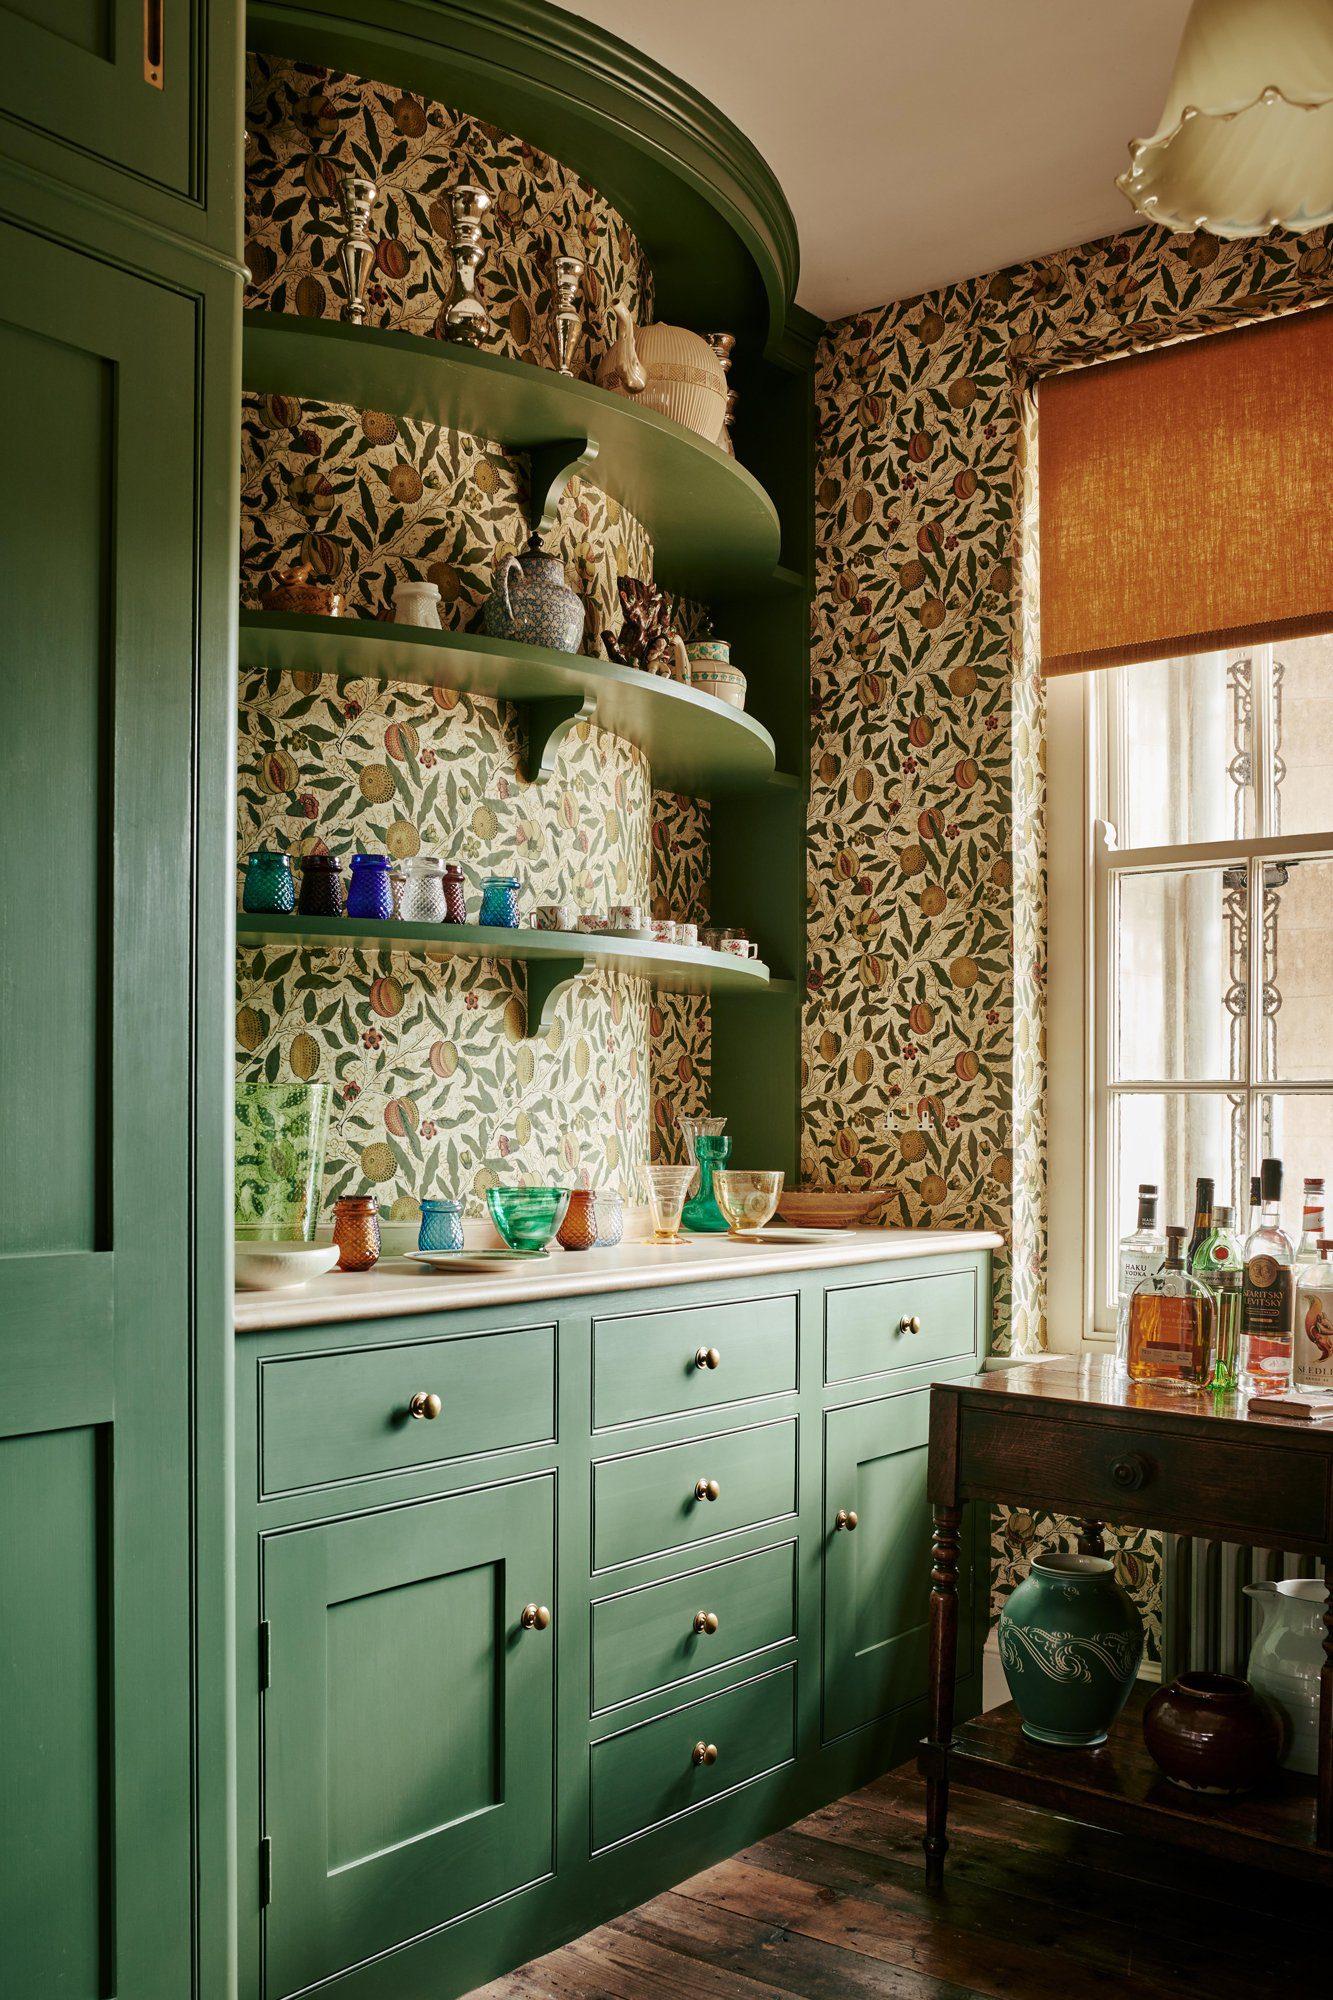 Kitchen with Allyson McDermott wallpaper